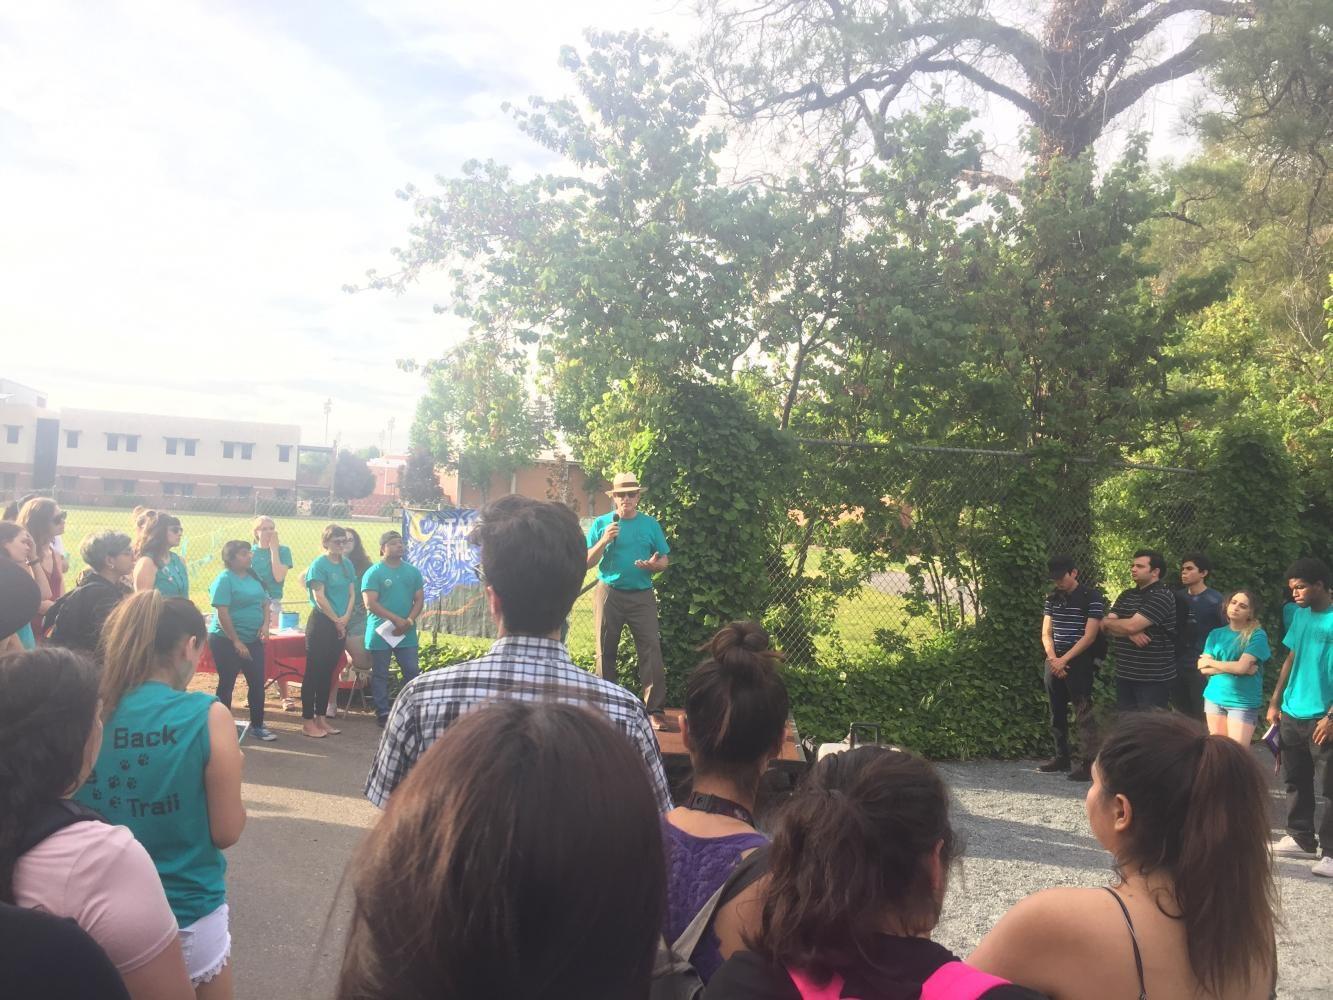 Chico State hosts an event regarding the stigma involving the